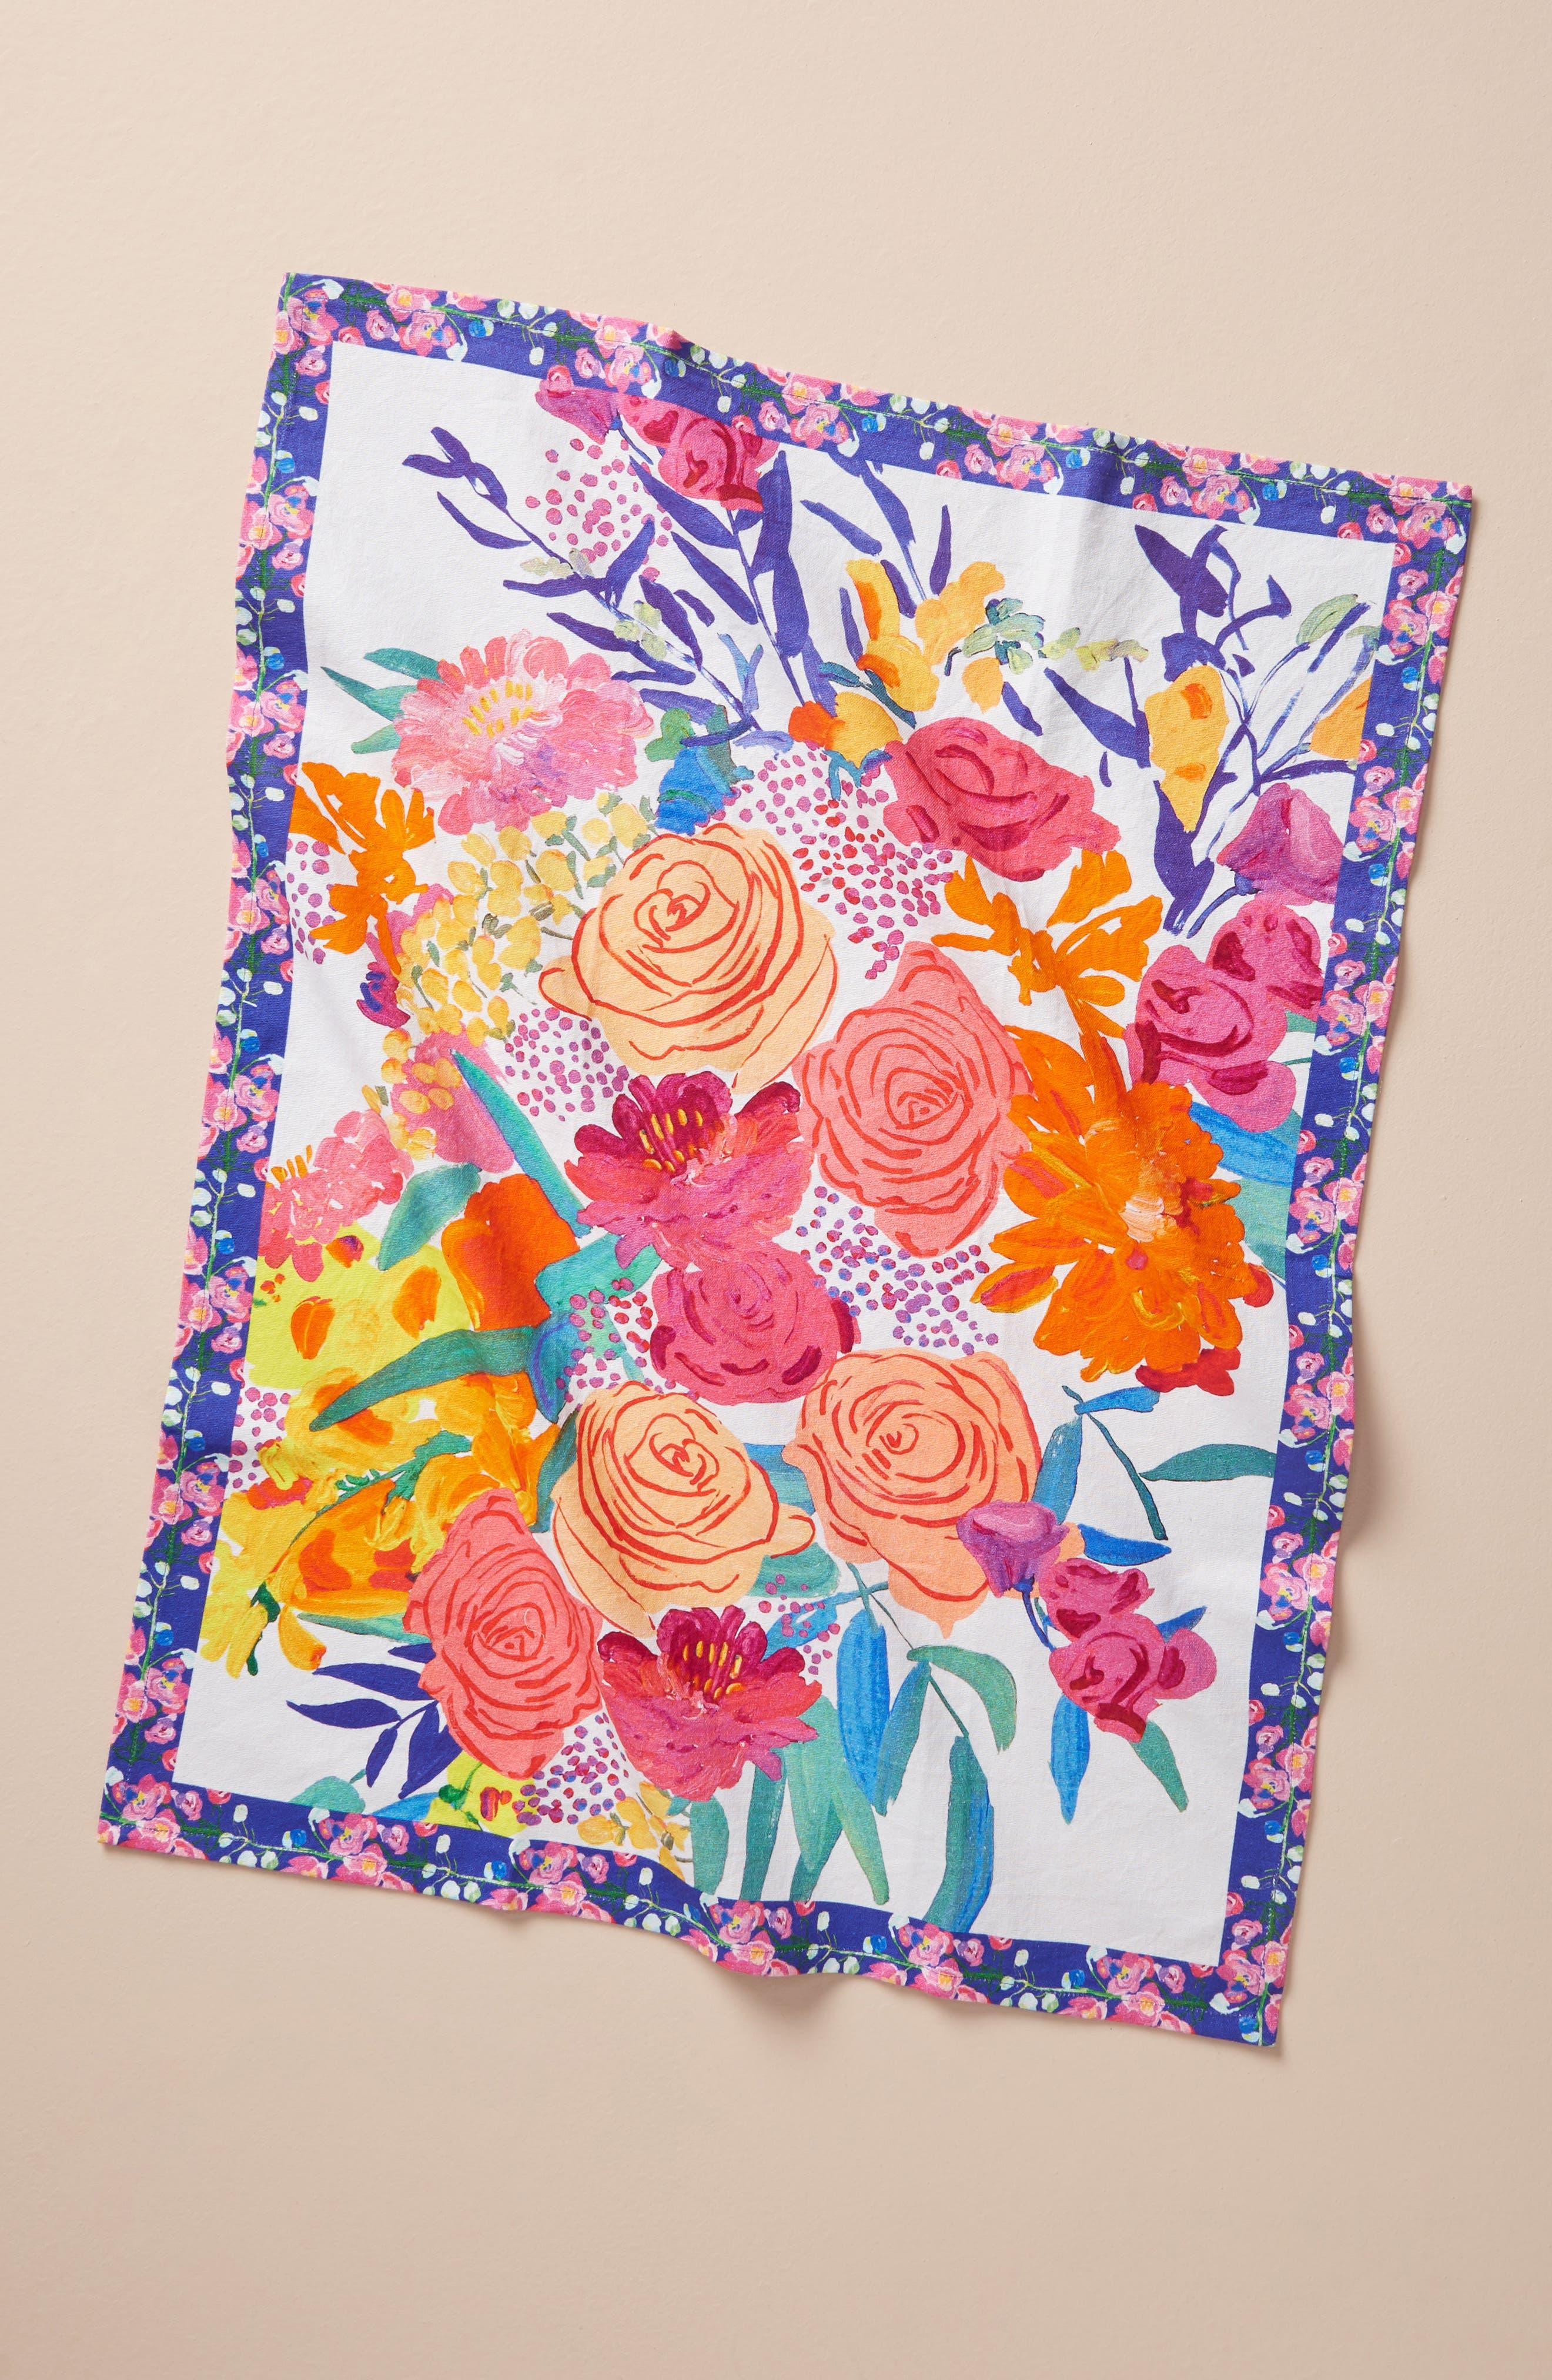 Alternate Image 1 Selected - Anthropologie Paint + Petals Dishtowel